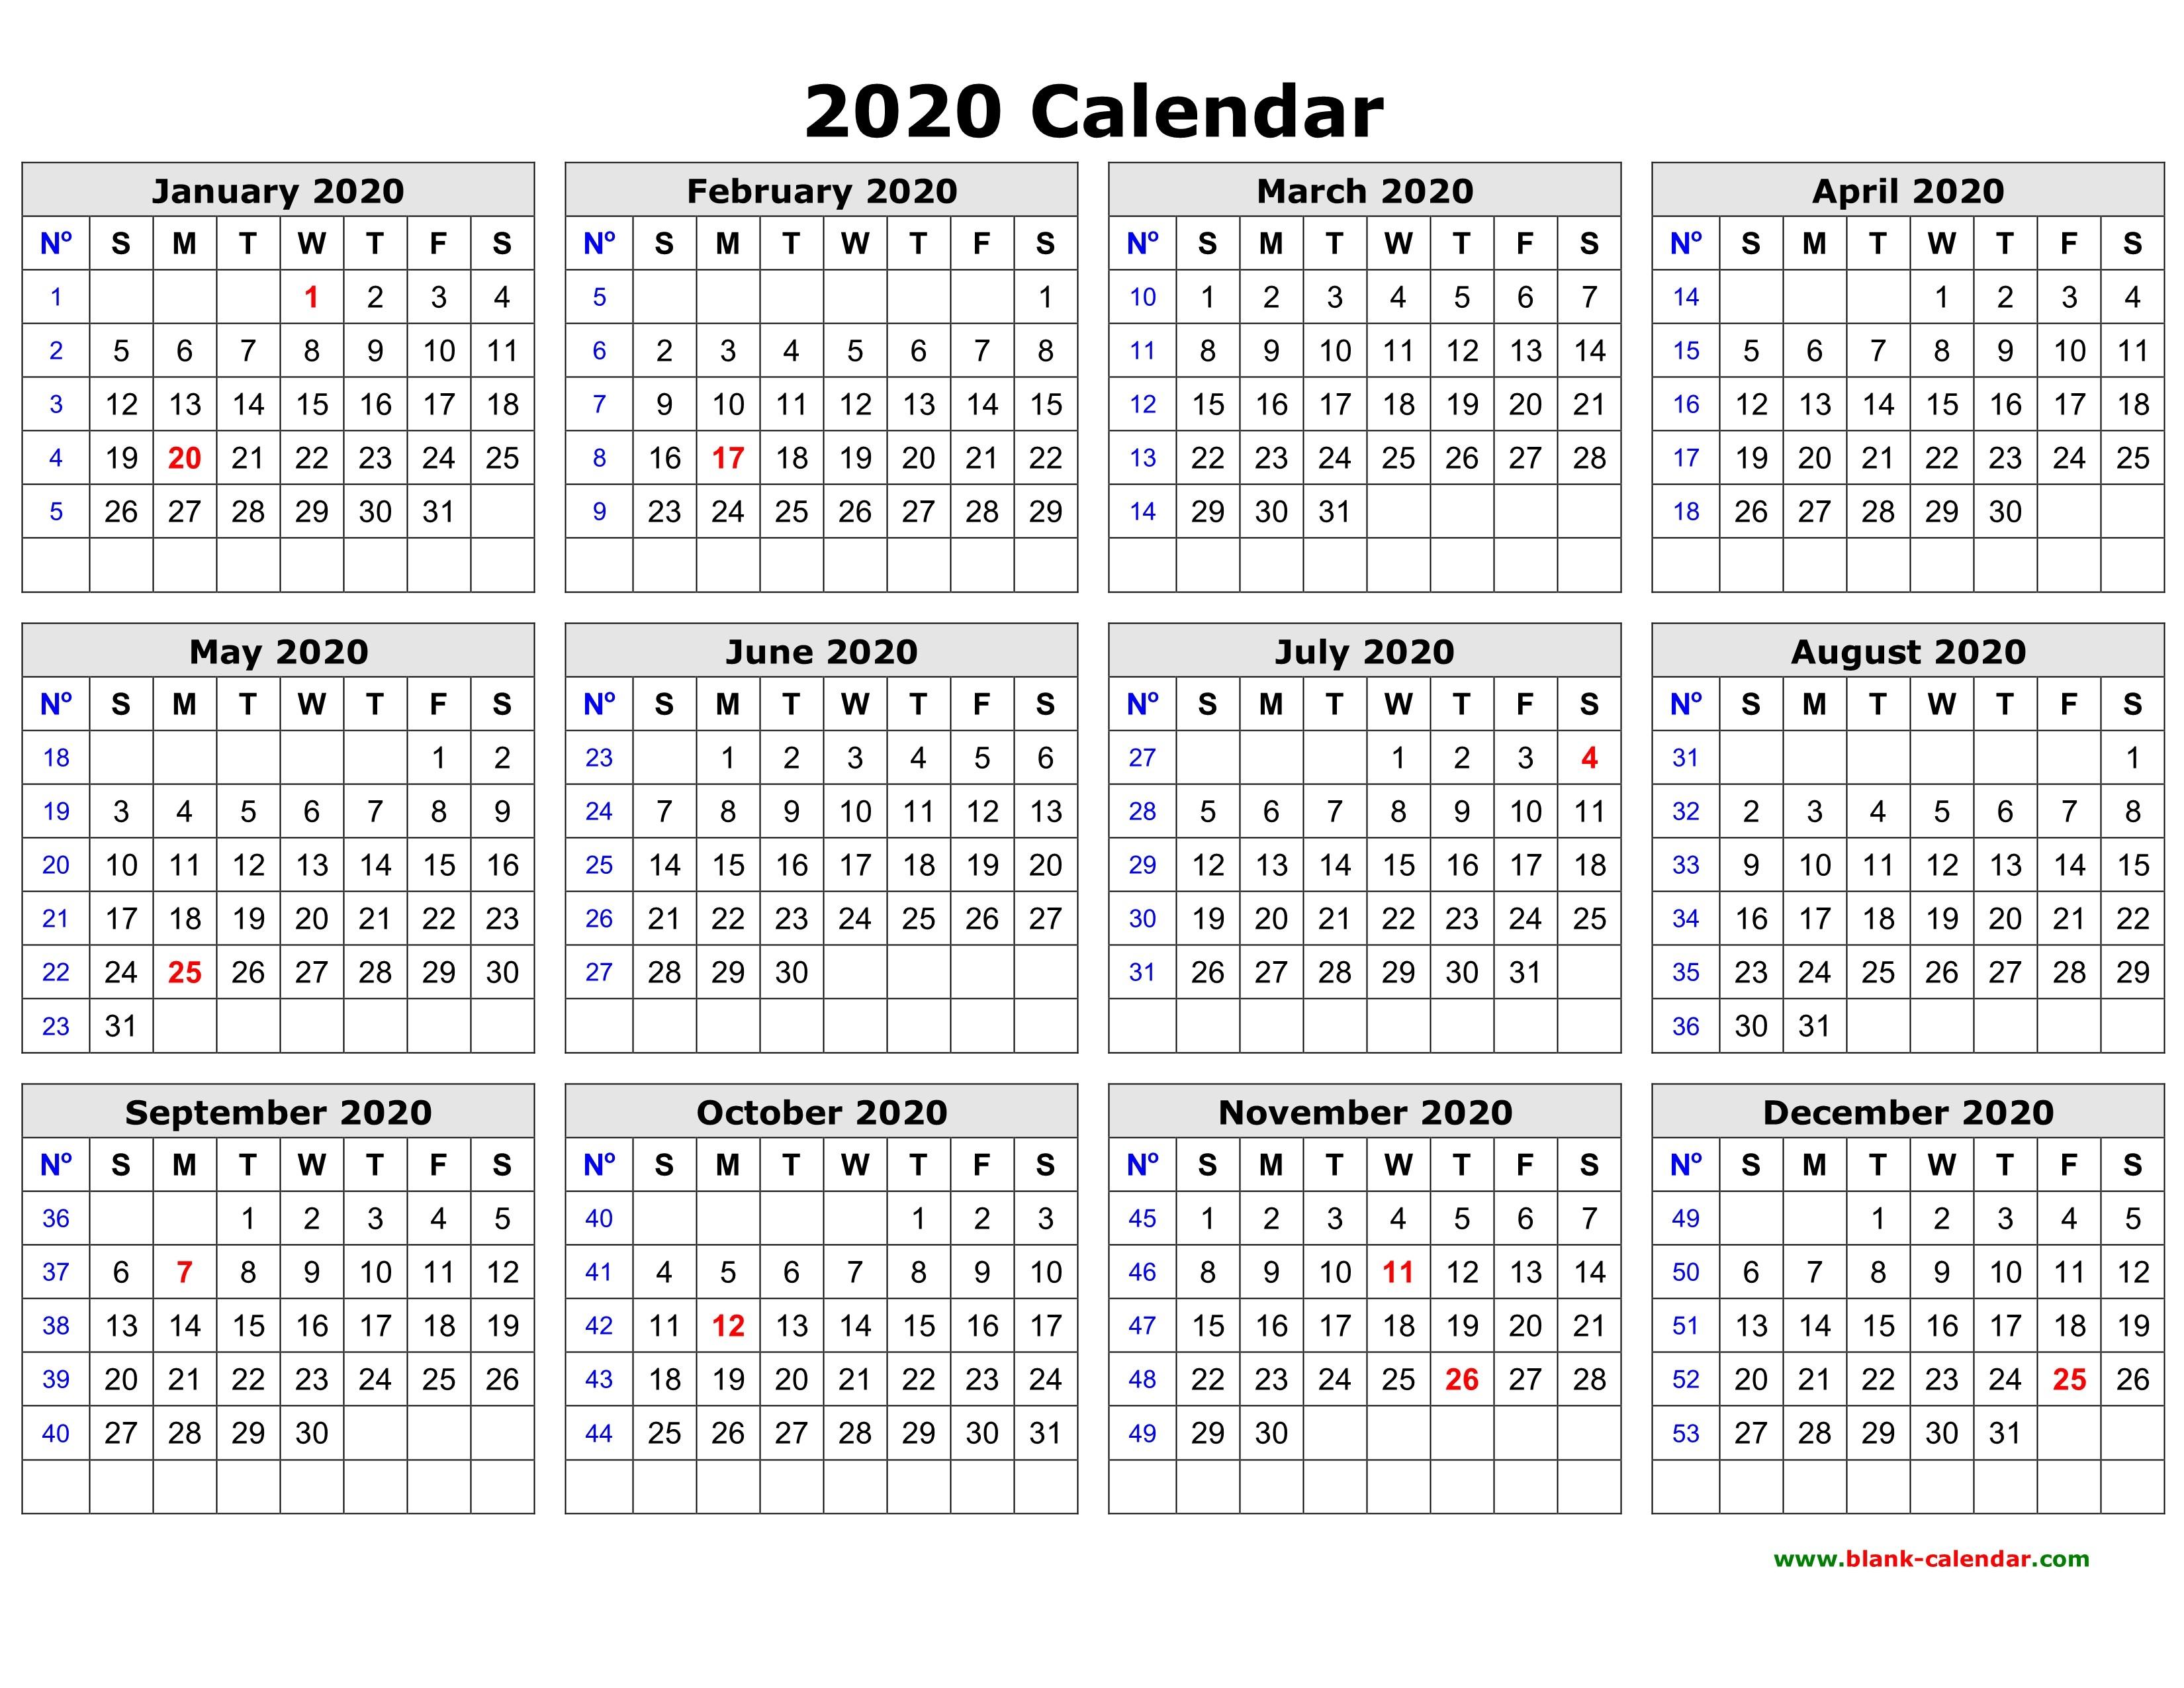 Free Calendar 2020 Printable Free Download Printable Calendar 2020 In One Page Clean